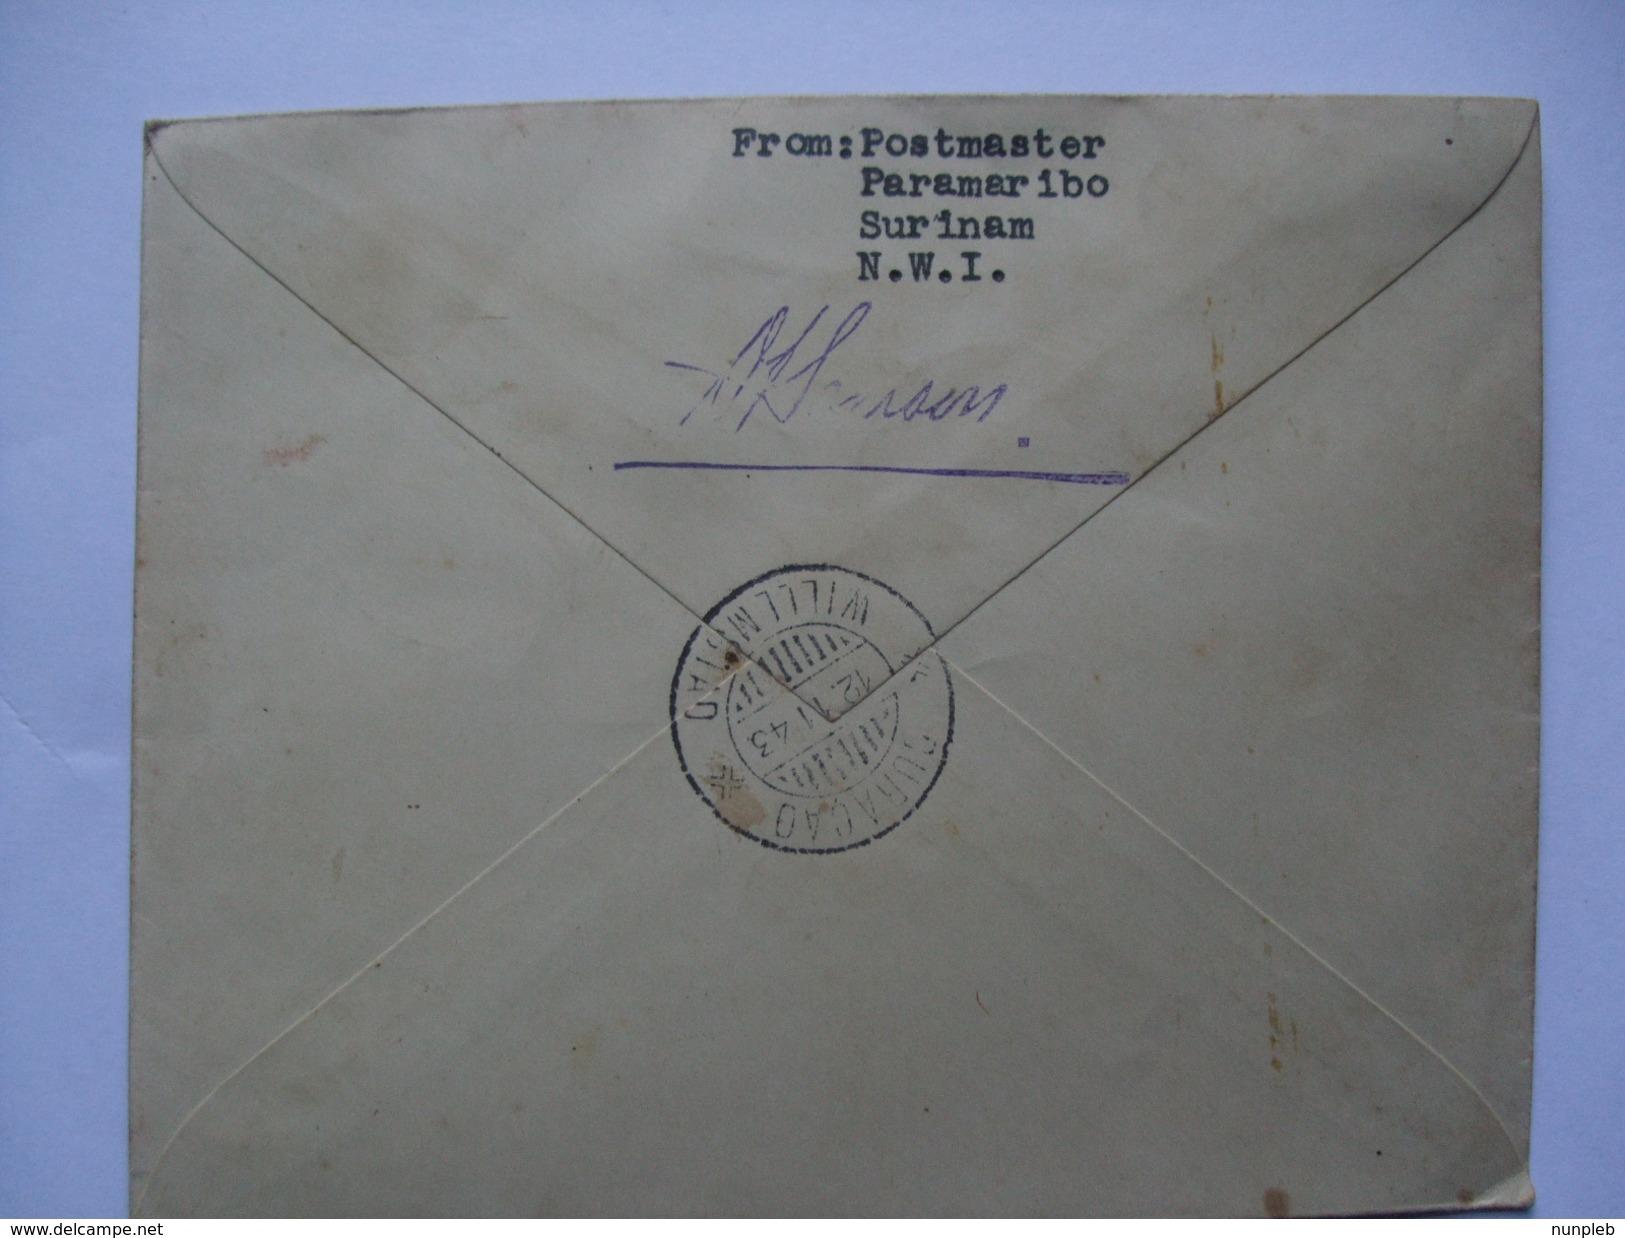 SURINAM 1943 FDC - Royal Baby Issue - Censor Mark - Registered Paramaribo - Willmstad - Signed By Postmaster - Surinam ... - 1975